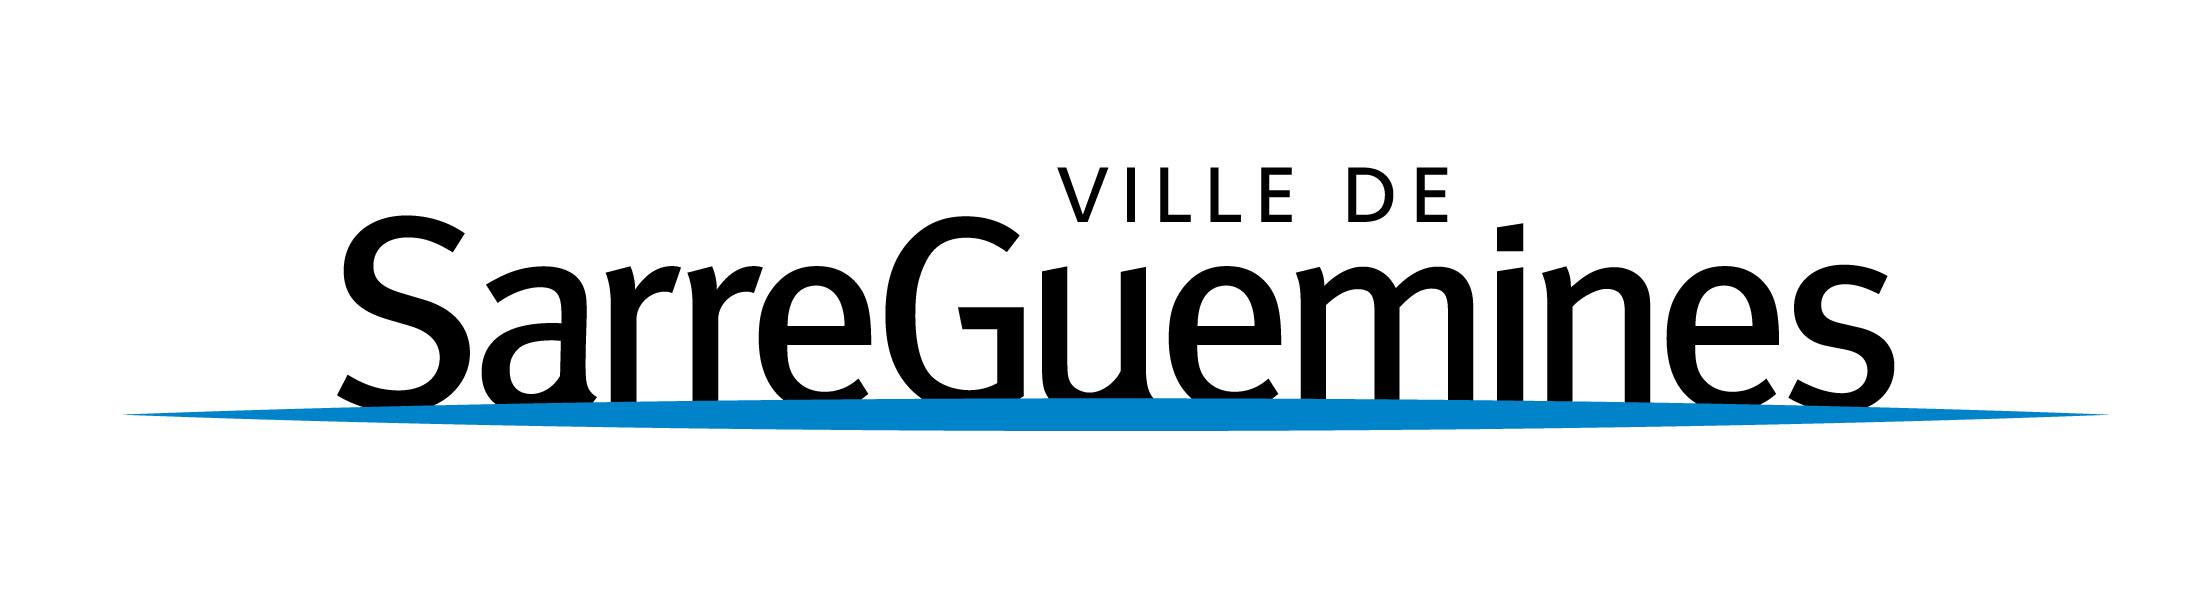 logo Sarreguemines